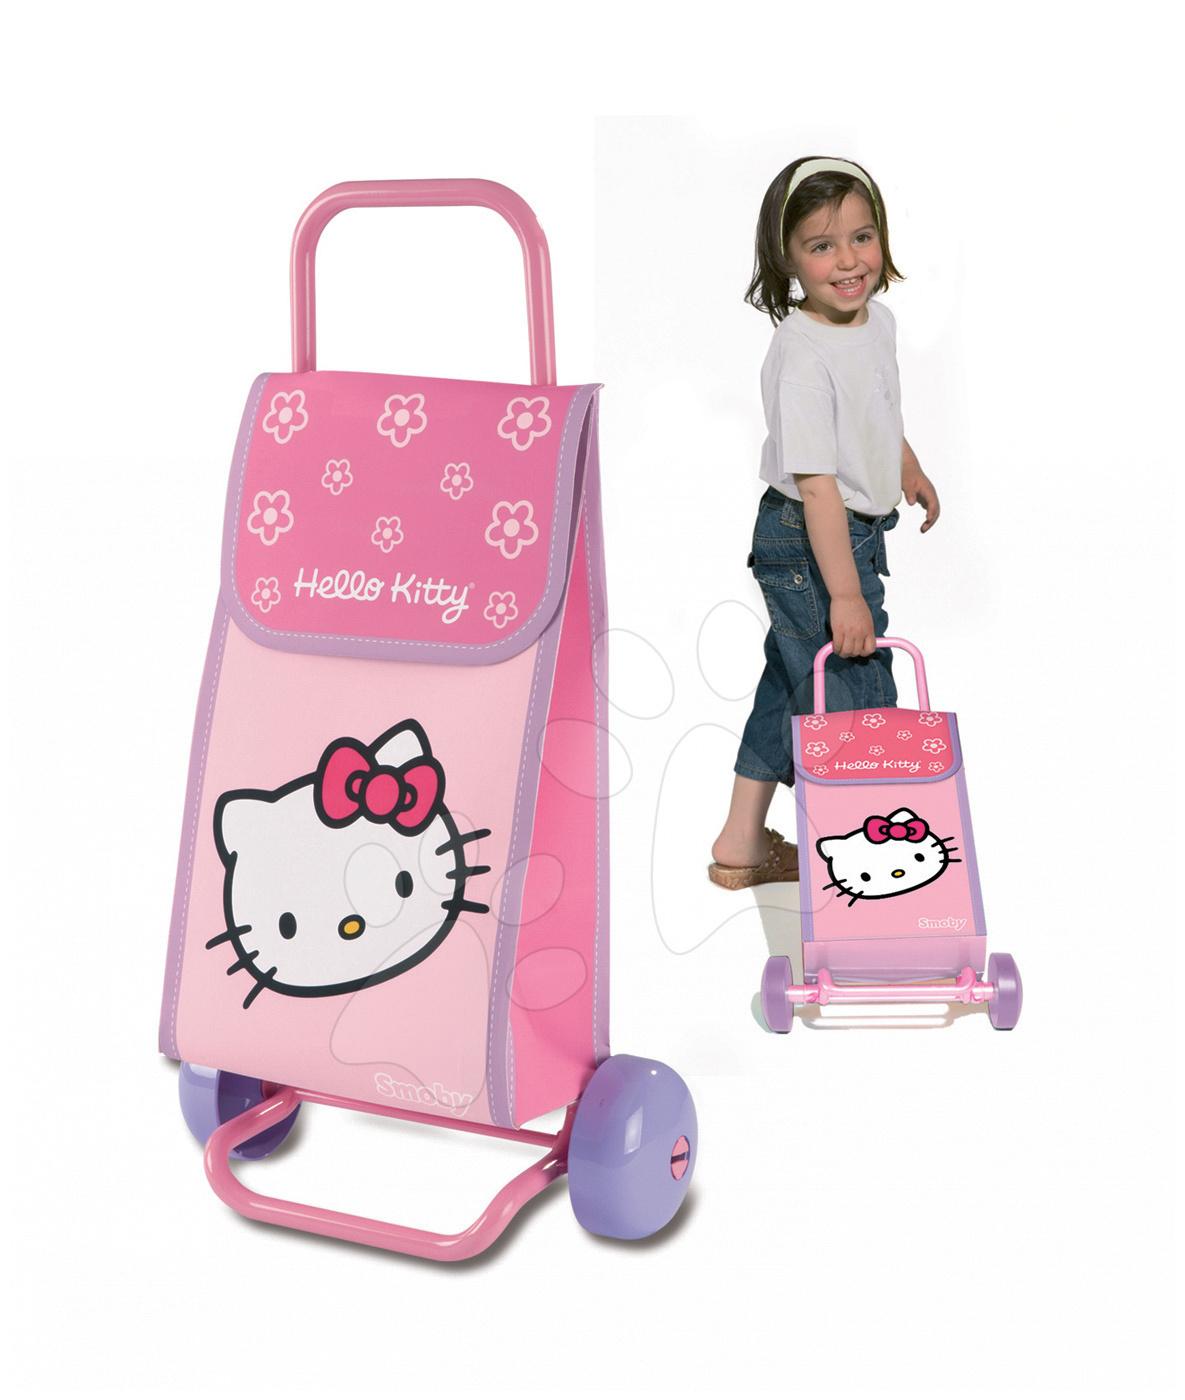 Nakupovalna torba Hello Kitty Smoby na kolesih